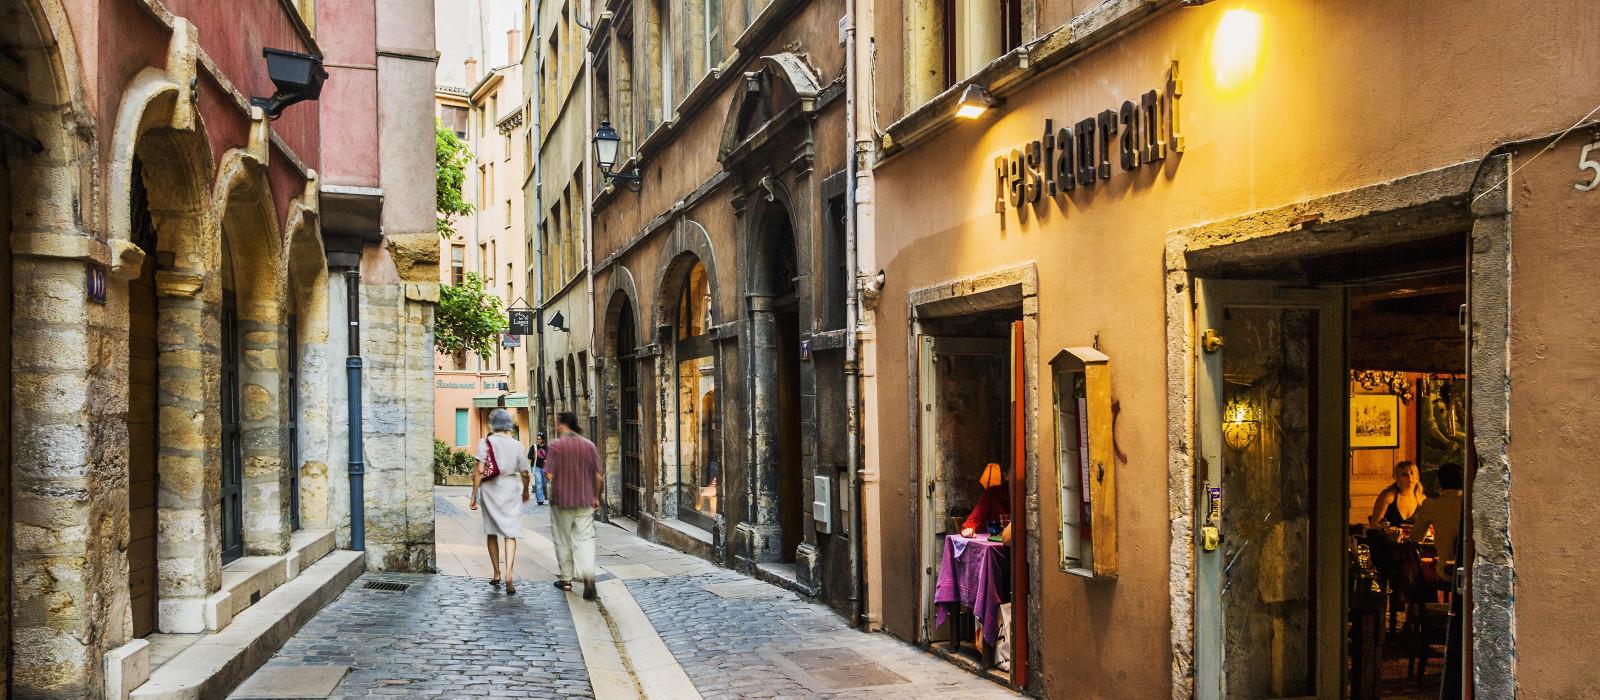 Balade au coeur du vieux Lyon